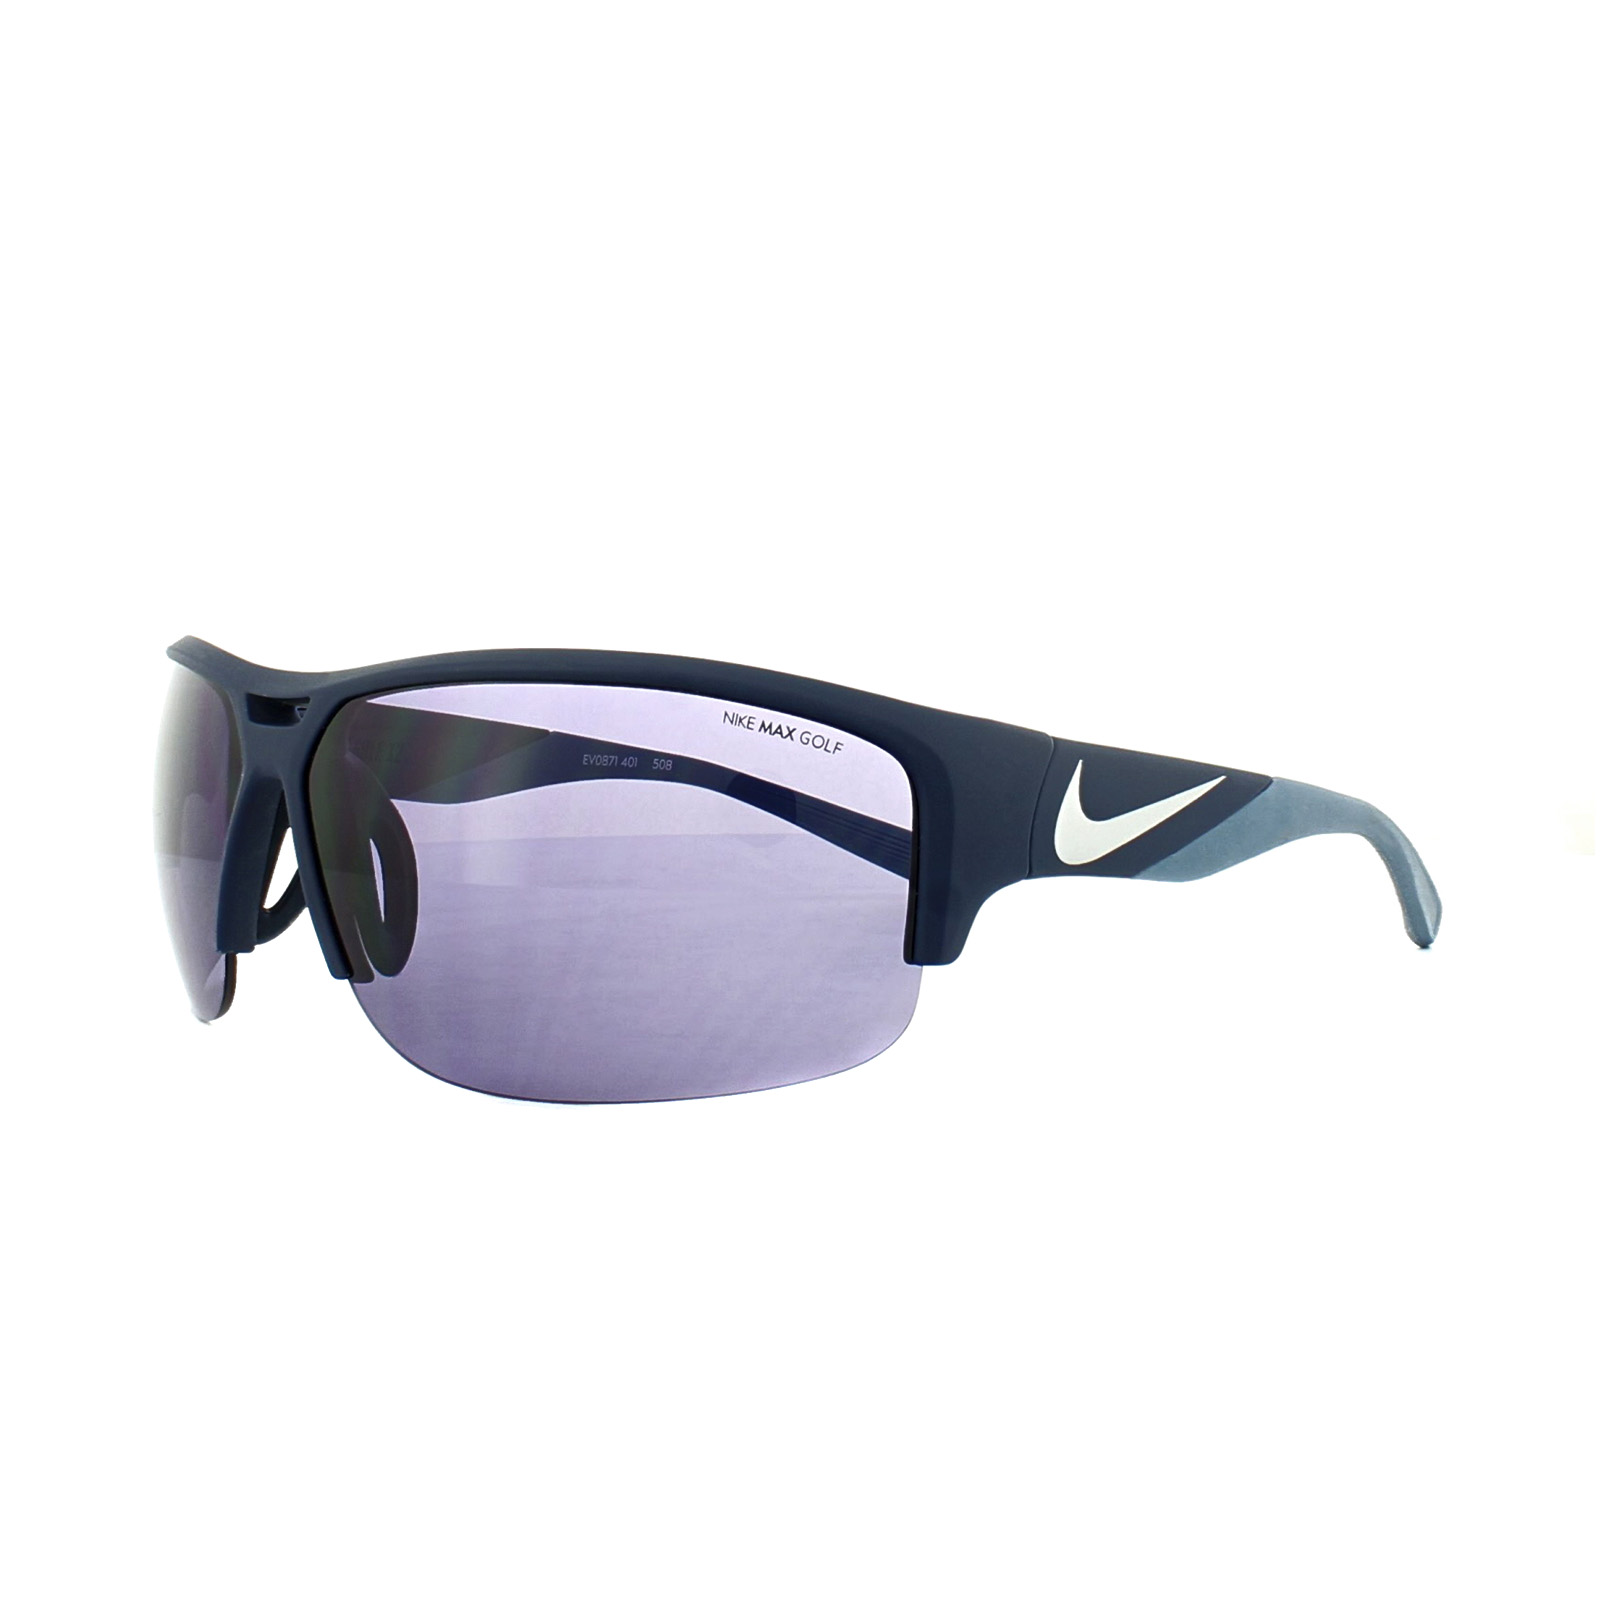 3467e31b437 Sentinel Nike Sunglasses Golf X2 E EV0871 401 Matt Midnight Navy Max Golf  Tint